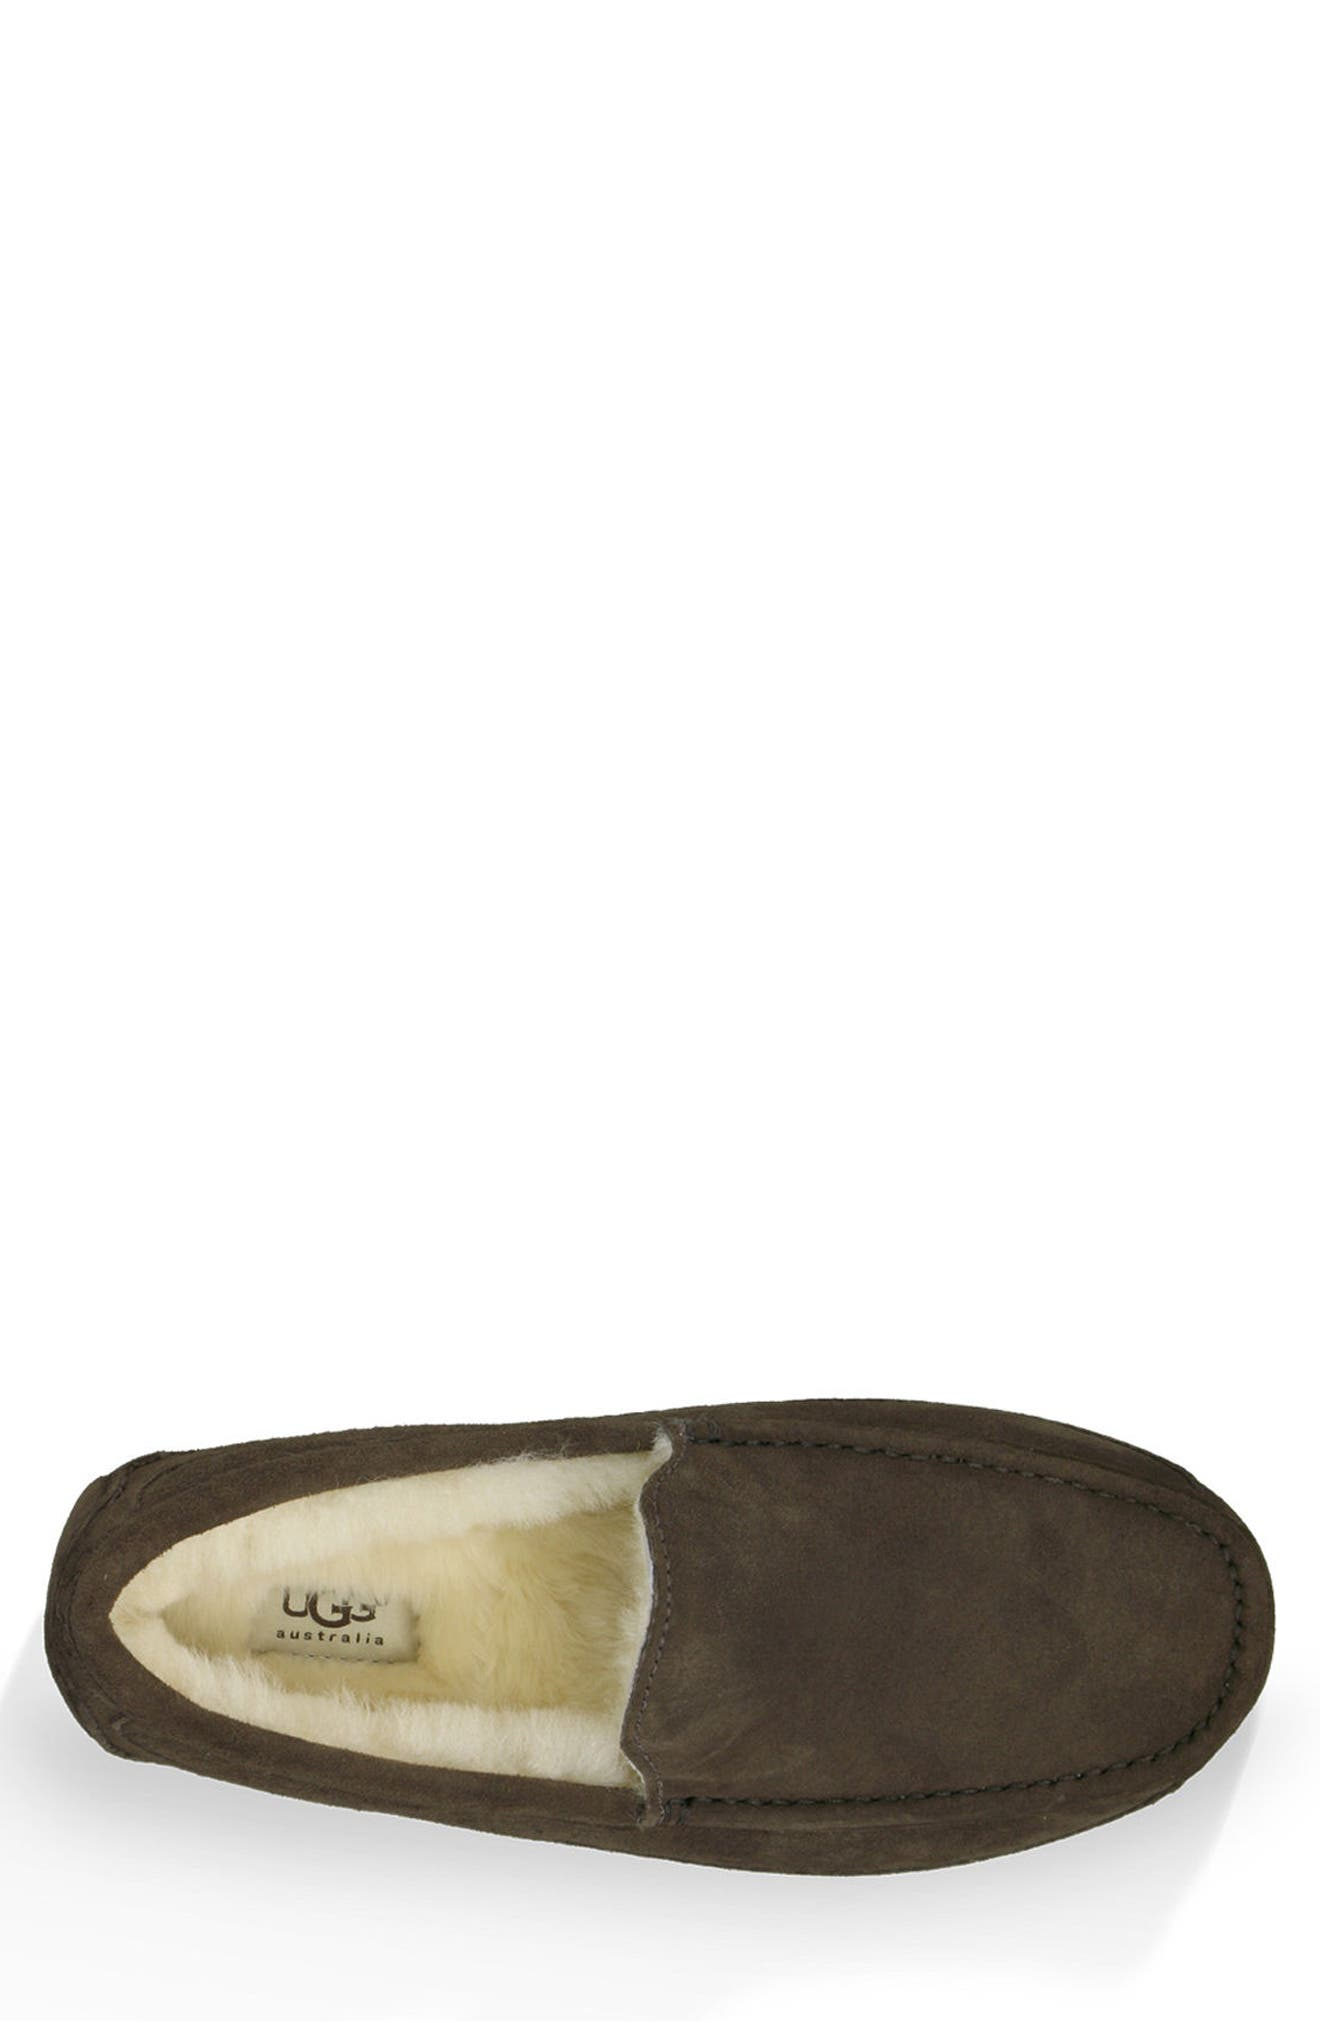 Ascot Slipper,                             Alternate thumbnail 4, color,                             ESPRESSO SUEDE